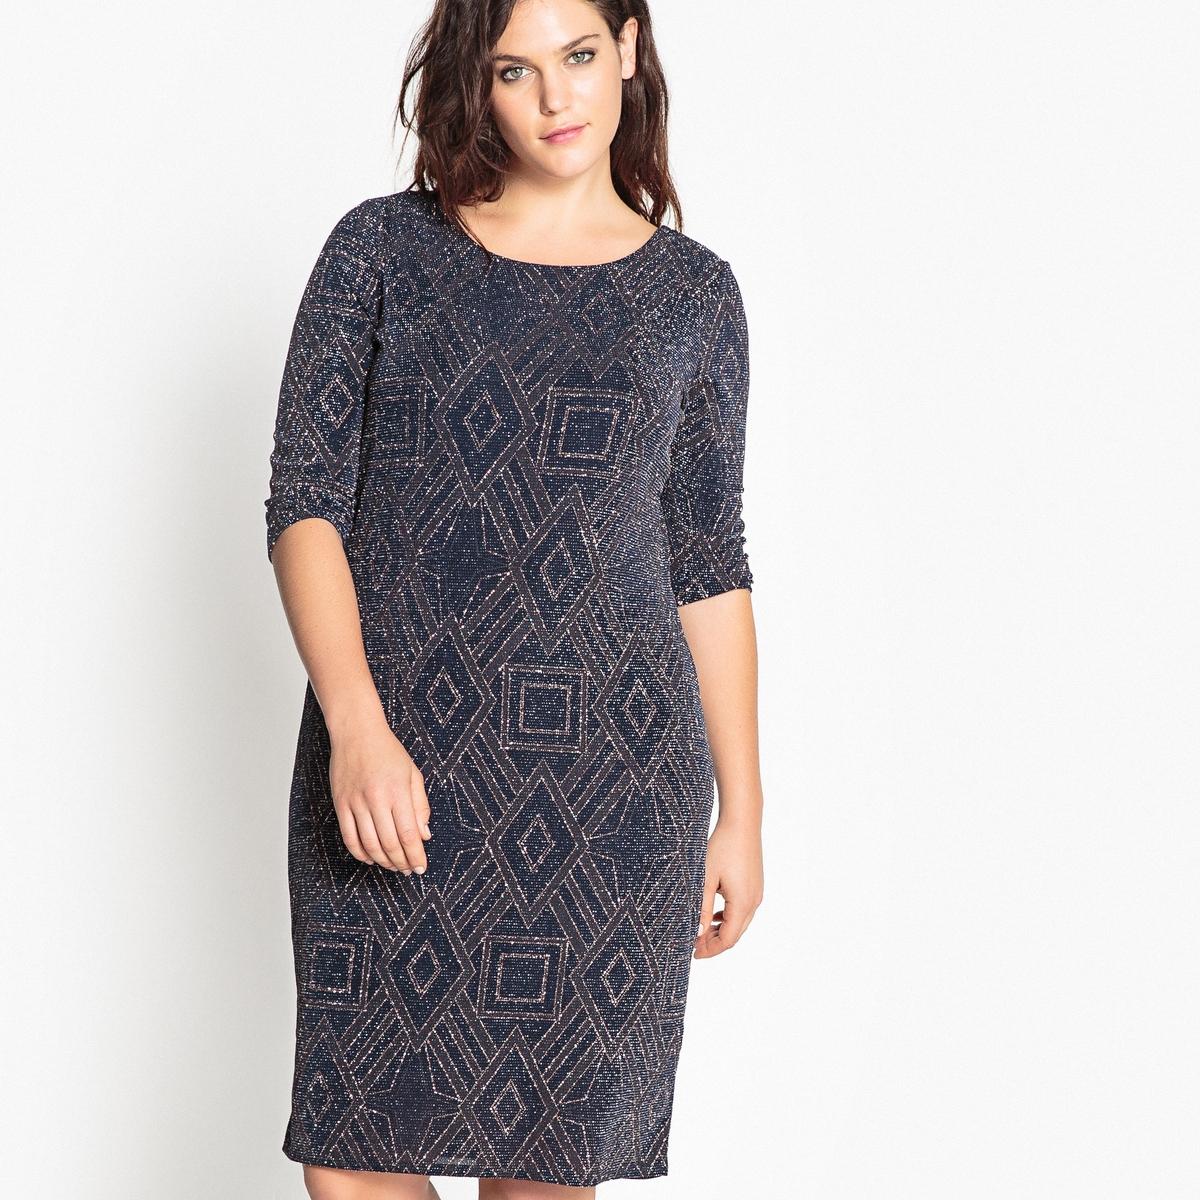 Платье прямое из трикотажа с рисунком